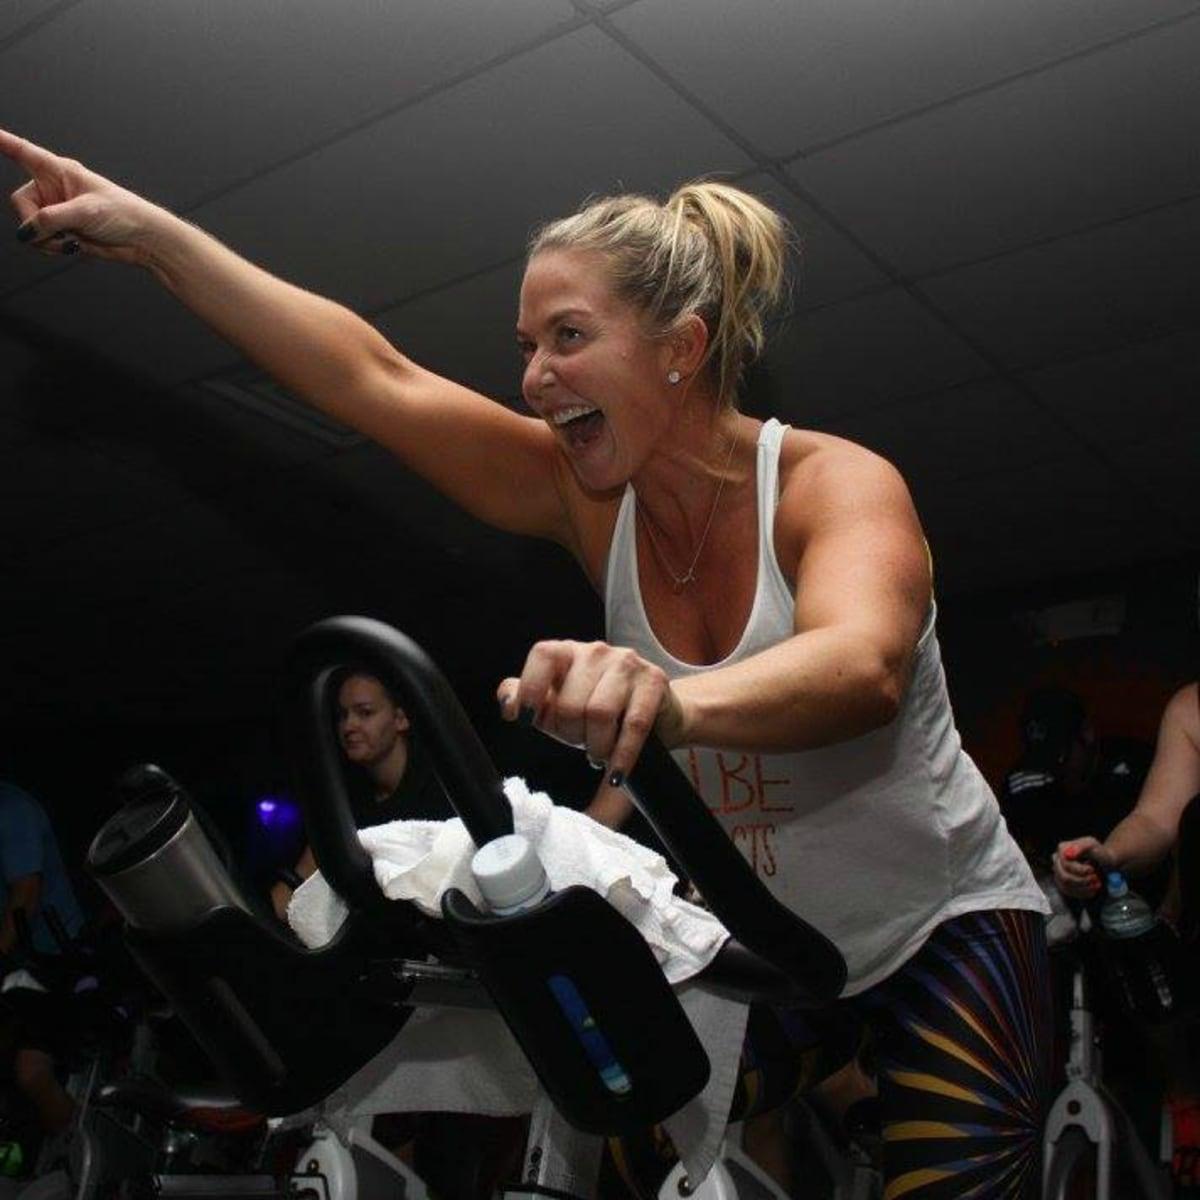 JoyRide Cycling Studio indoor bike cycle instructor 2015